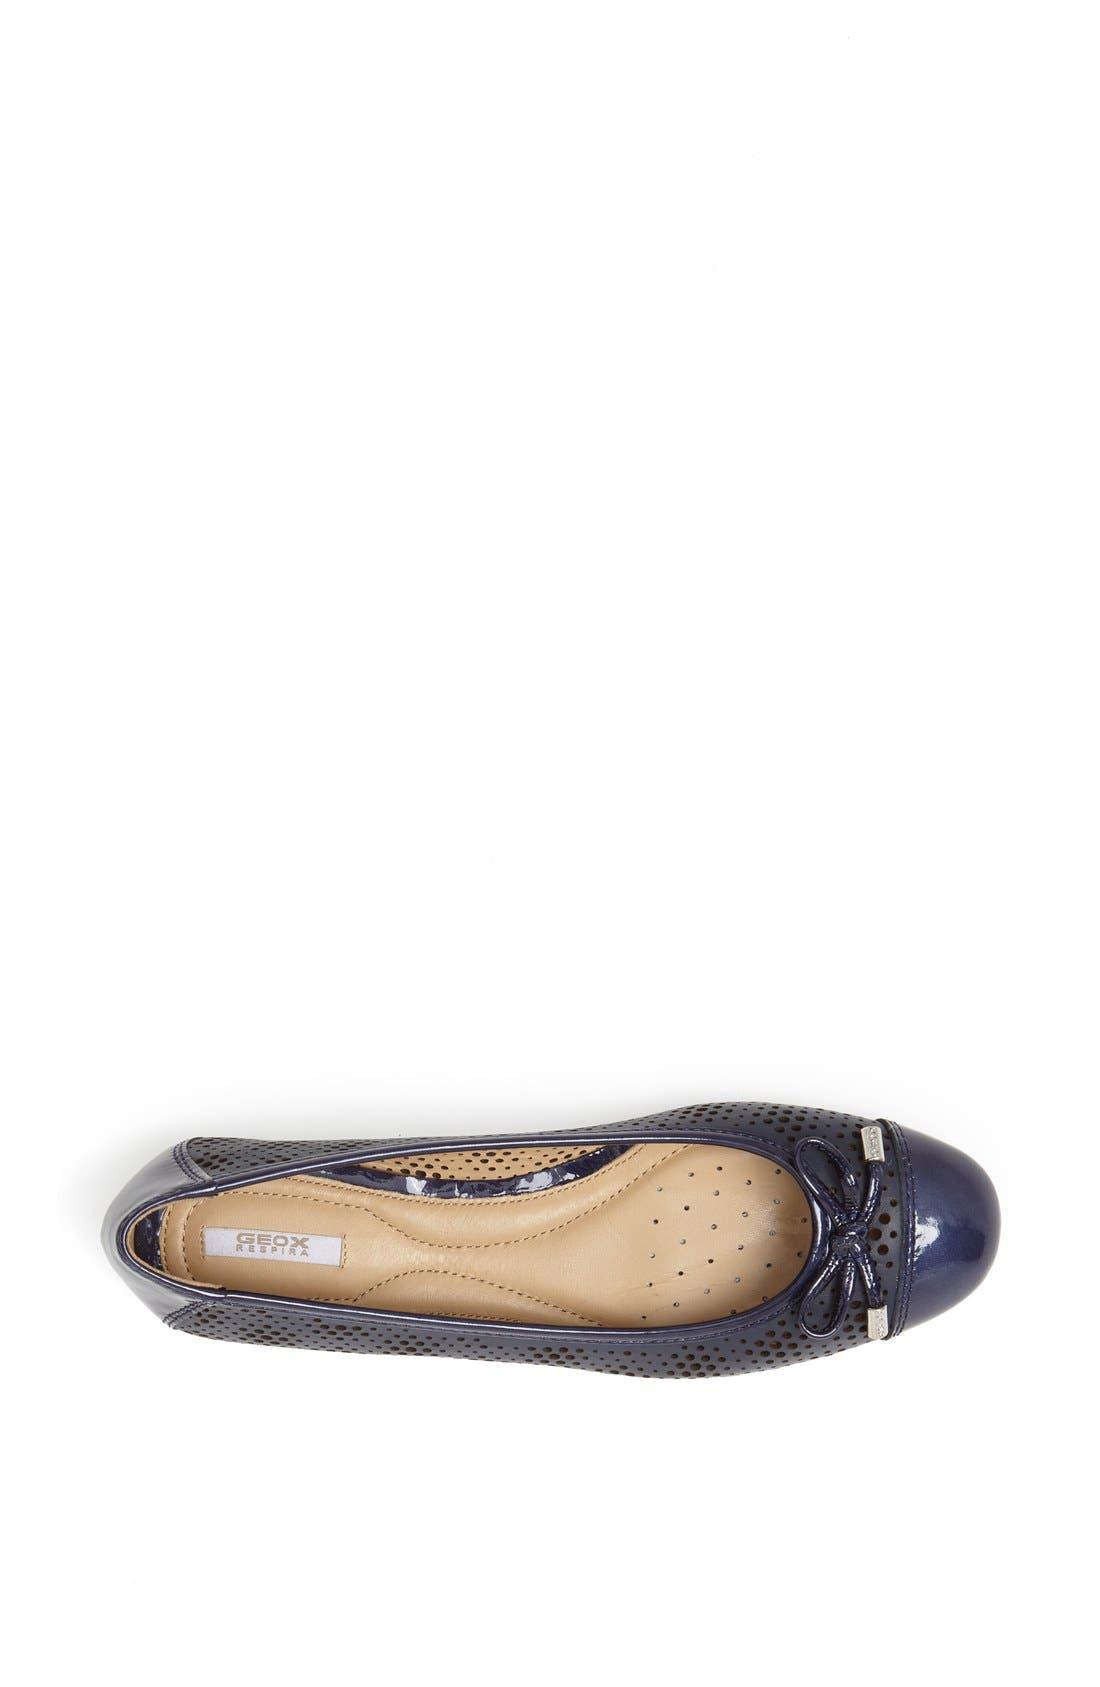 Alternate Image 3  - Geox 'Lola' Cap Toe Ballet Flat